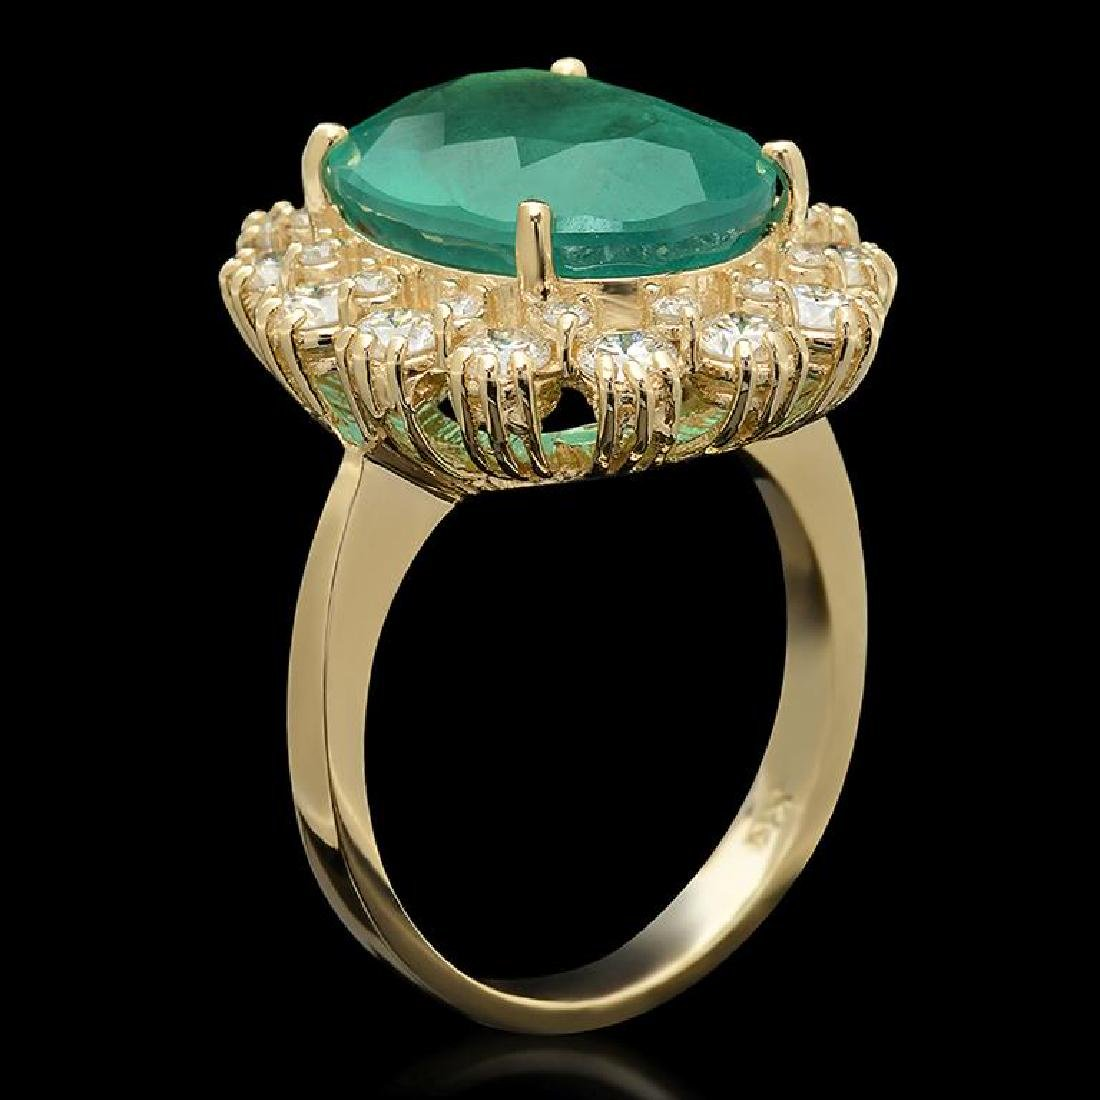 14K Gold 6.80ct Emerald 1.42ct Diamond Ring - 2